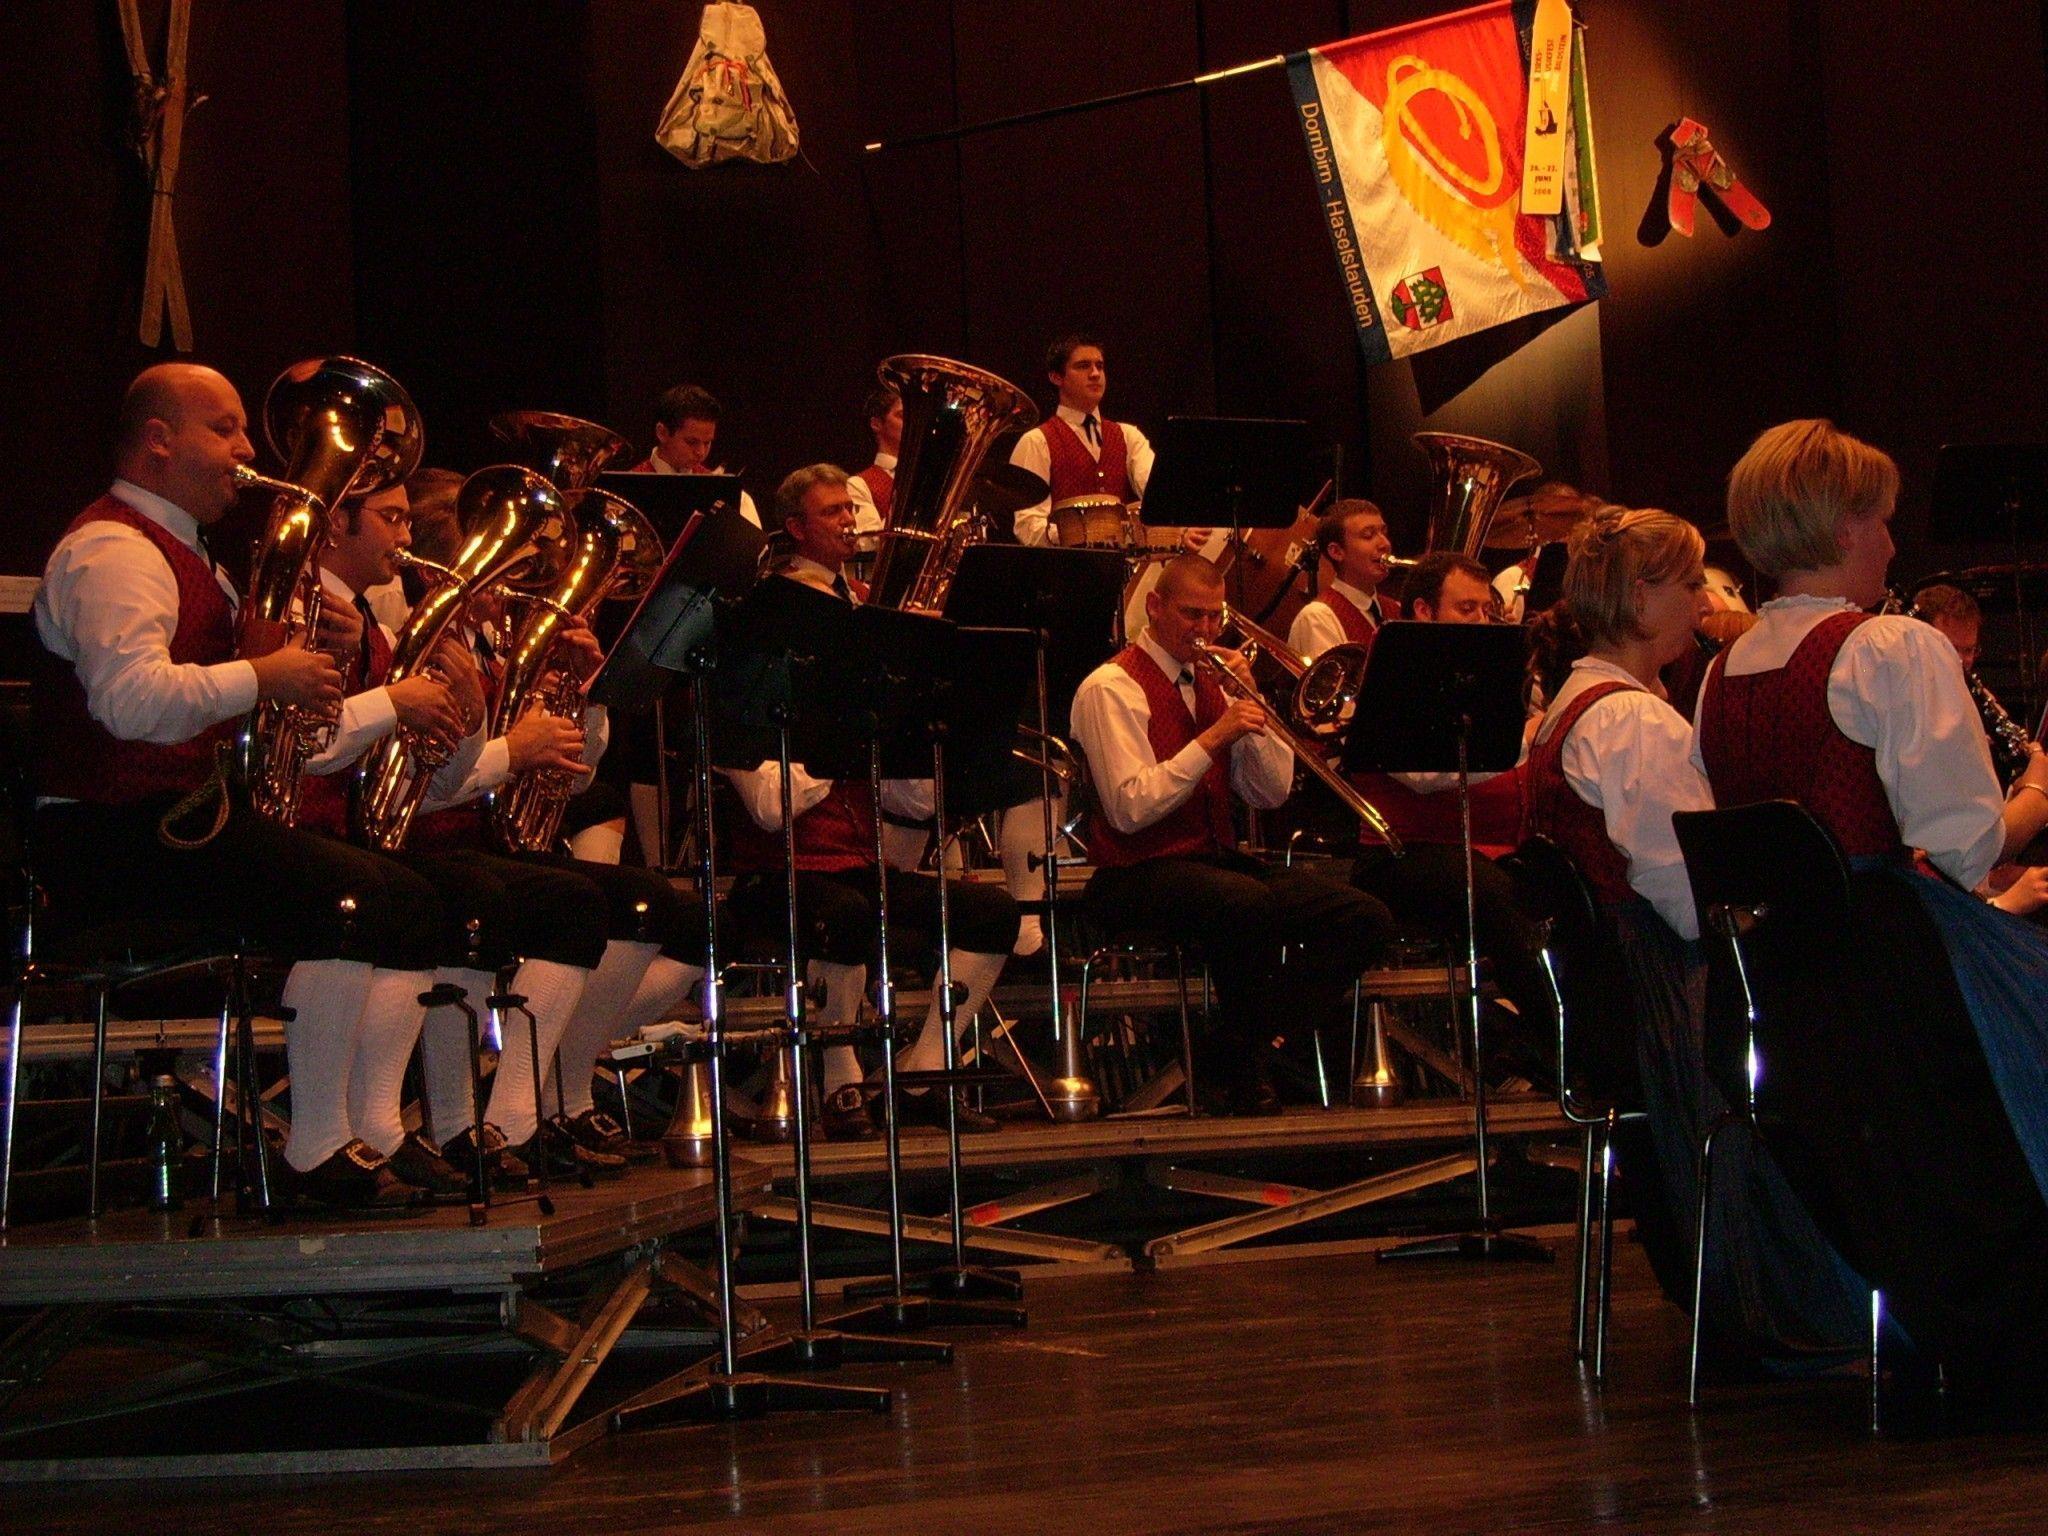 Die Stadtkapelle Haselstauden lädt am 24. November um 19:30 Uhr zum Konzert ins Kulturhaus.